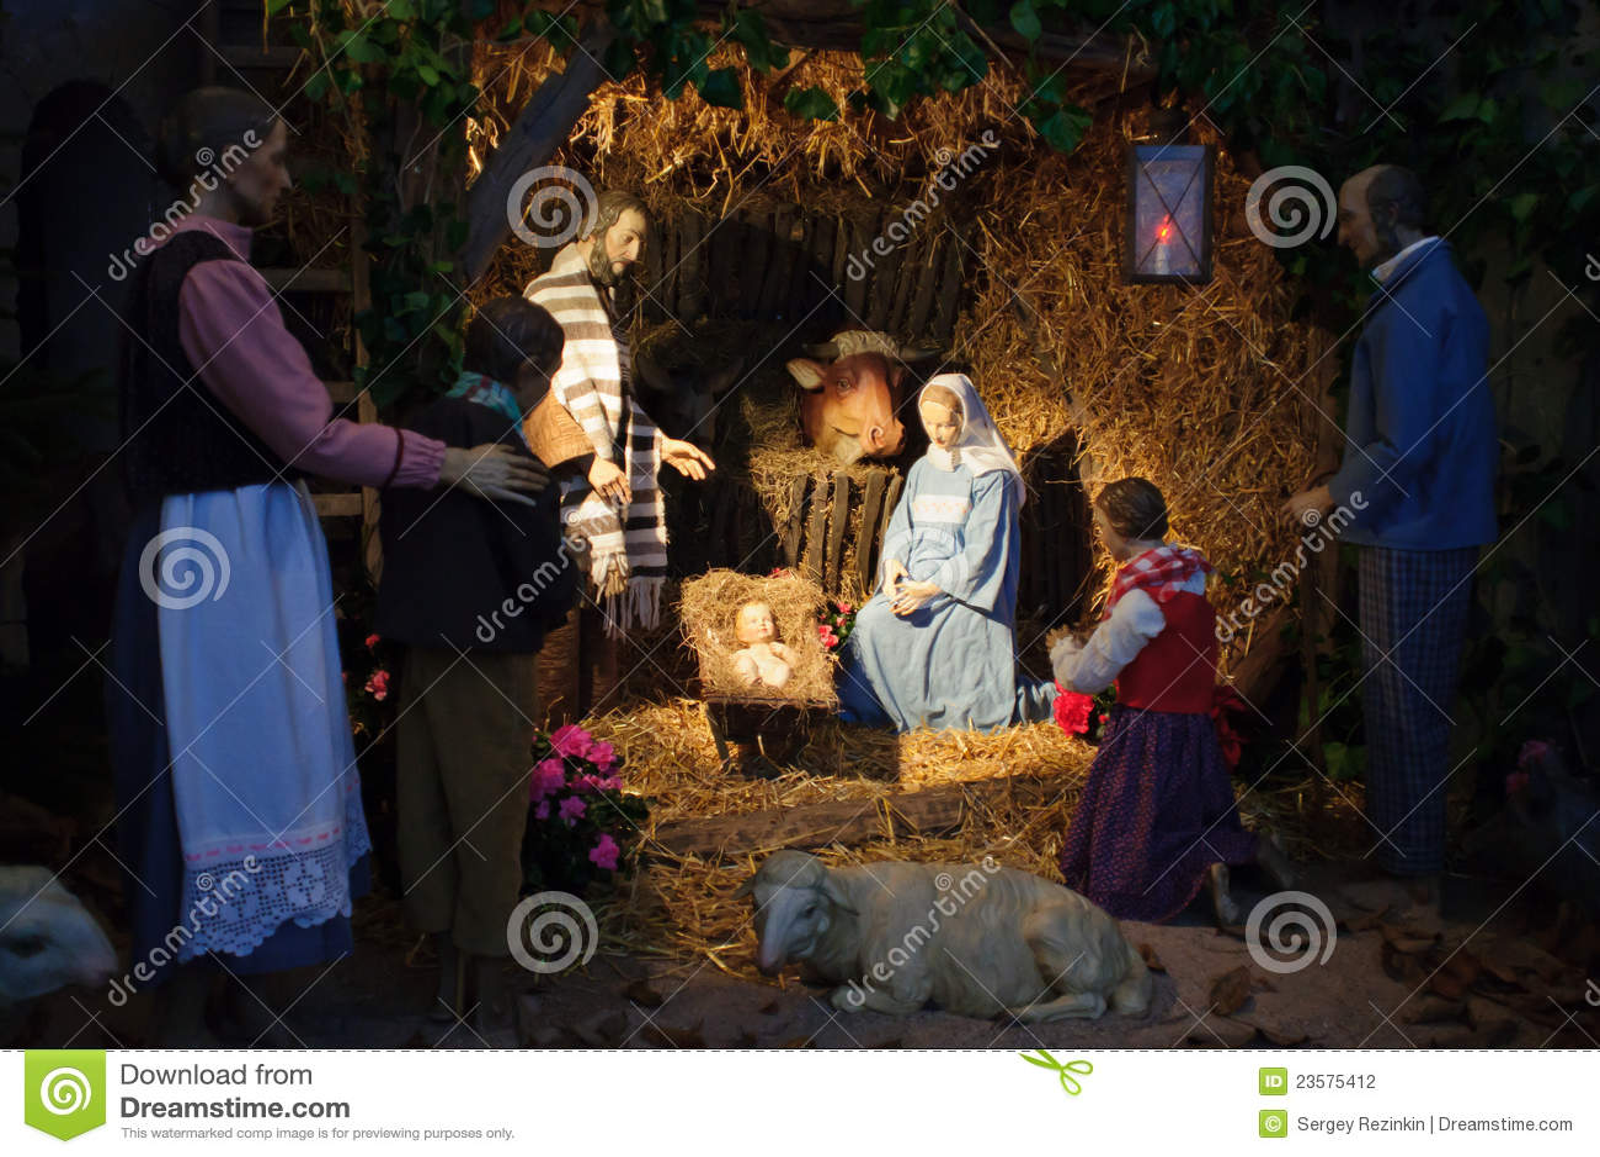 Christmas Scene With Three Wise Men And Baby Jesus Stock Photo ...